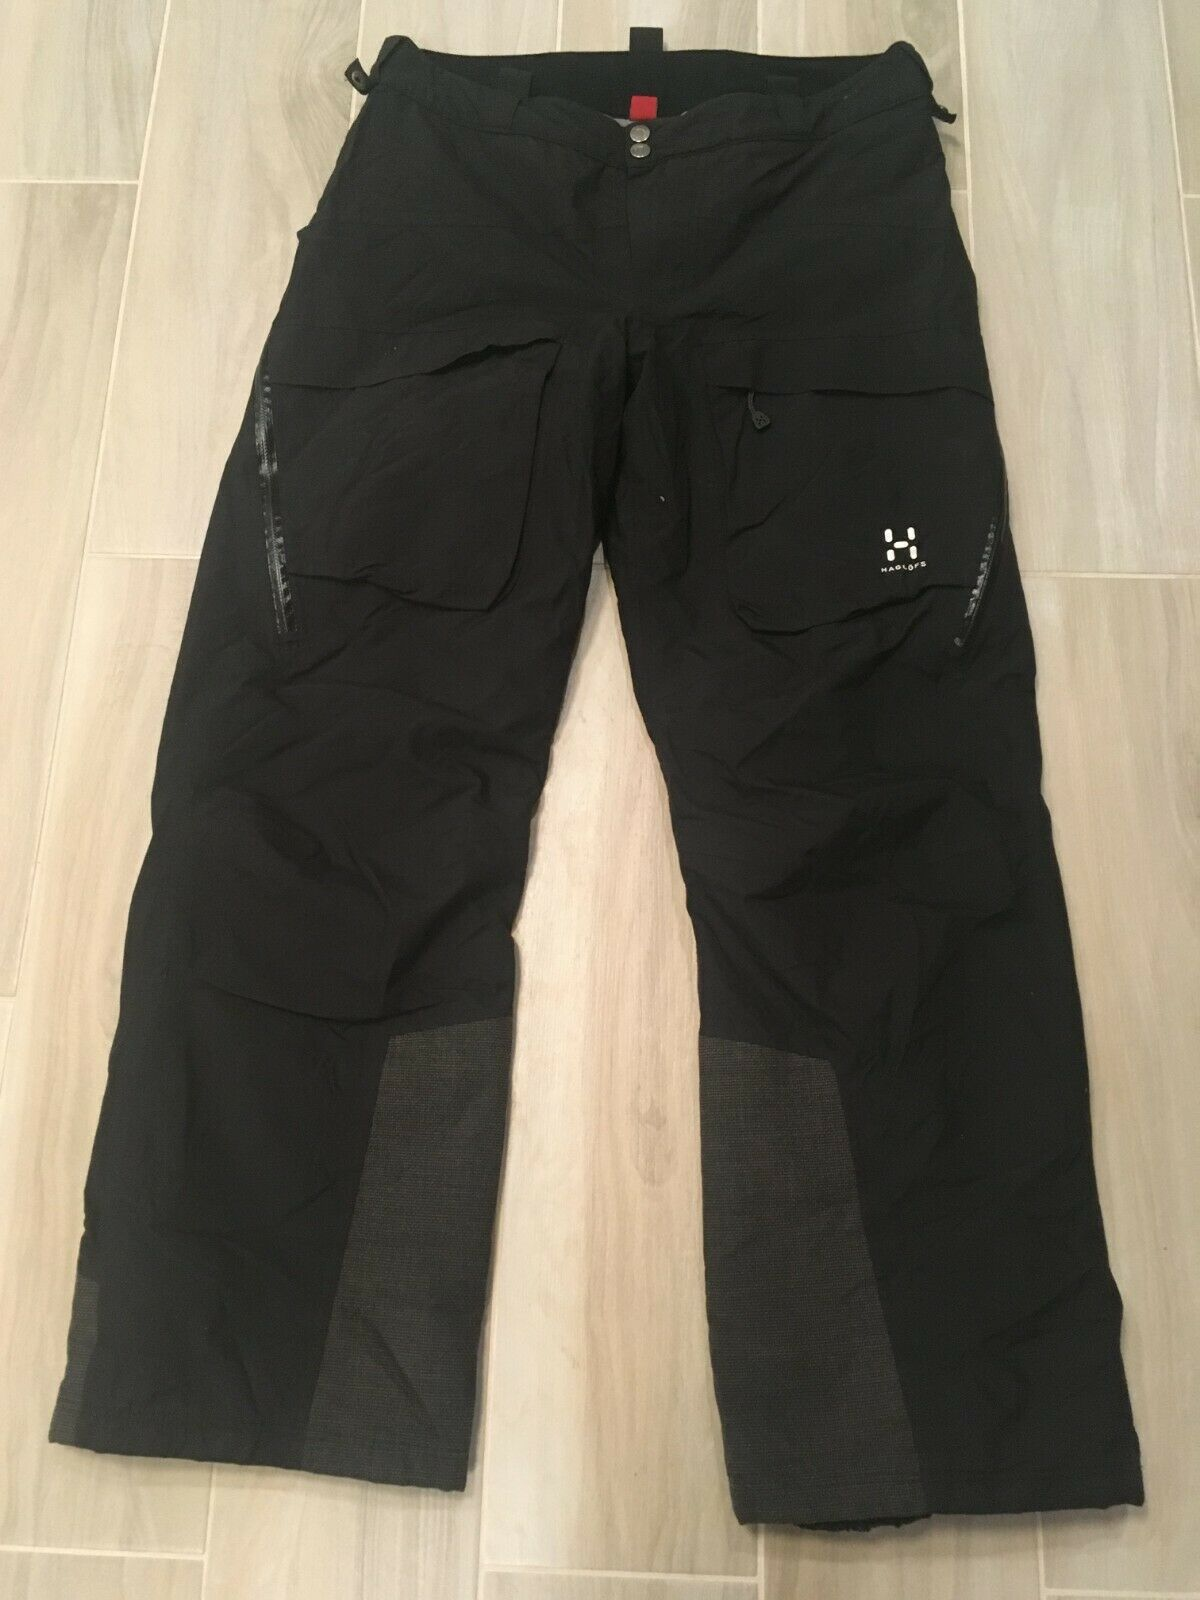 Haglöfs Gore-Tex Hiking Pants Trekking Primaloft Insulation Women's Size M